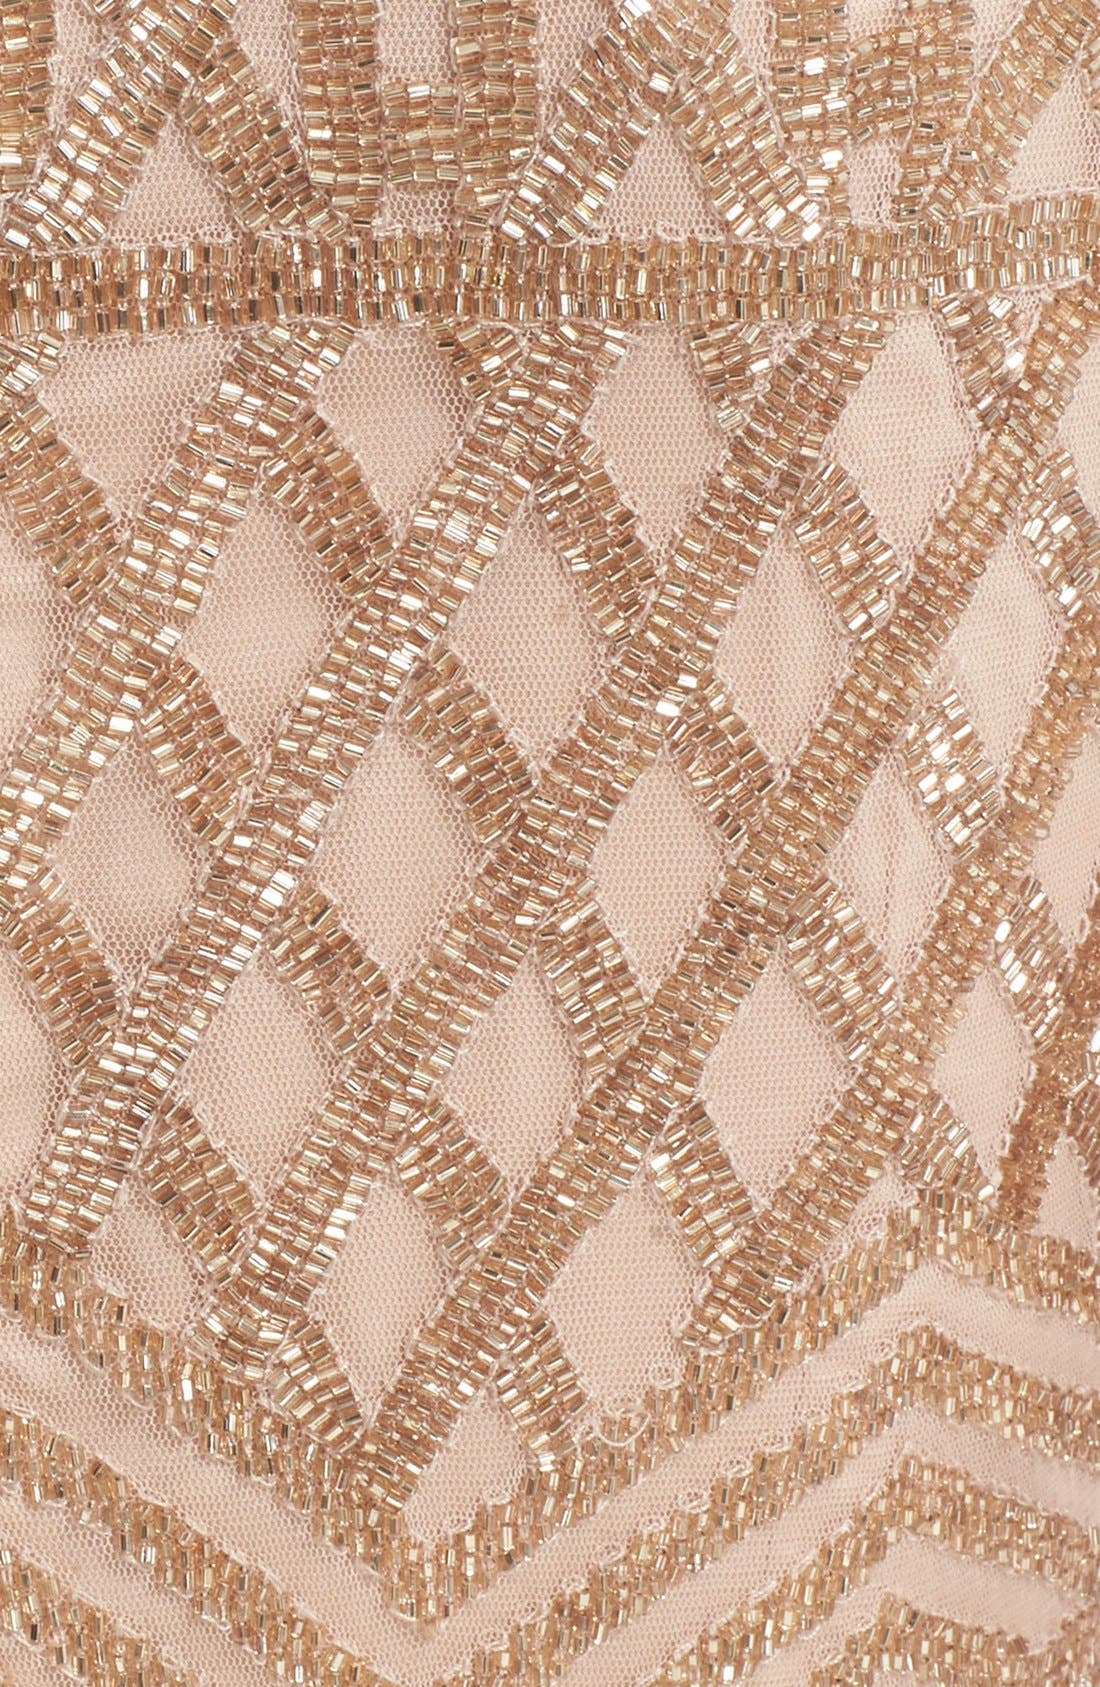 Beaded High Neck Sheath Dress,                             Alternate thumbnail 3, color,                             710